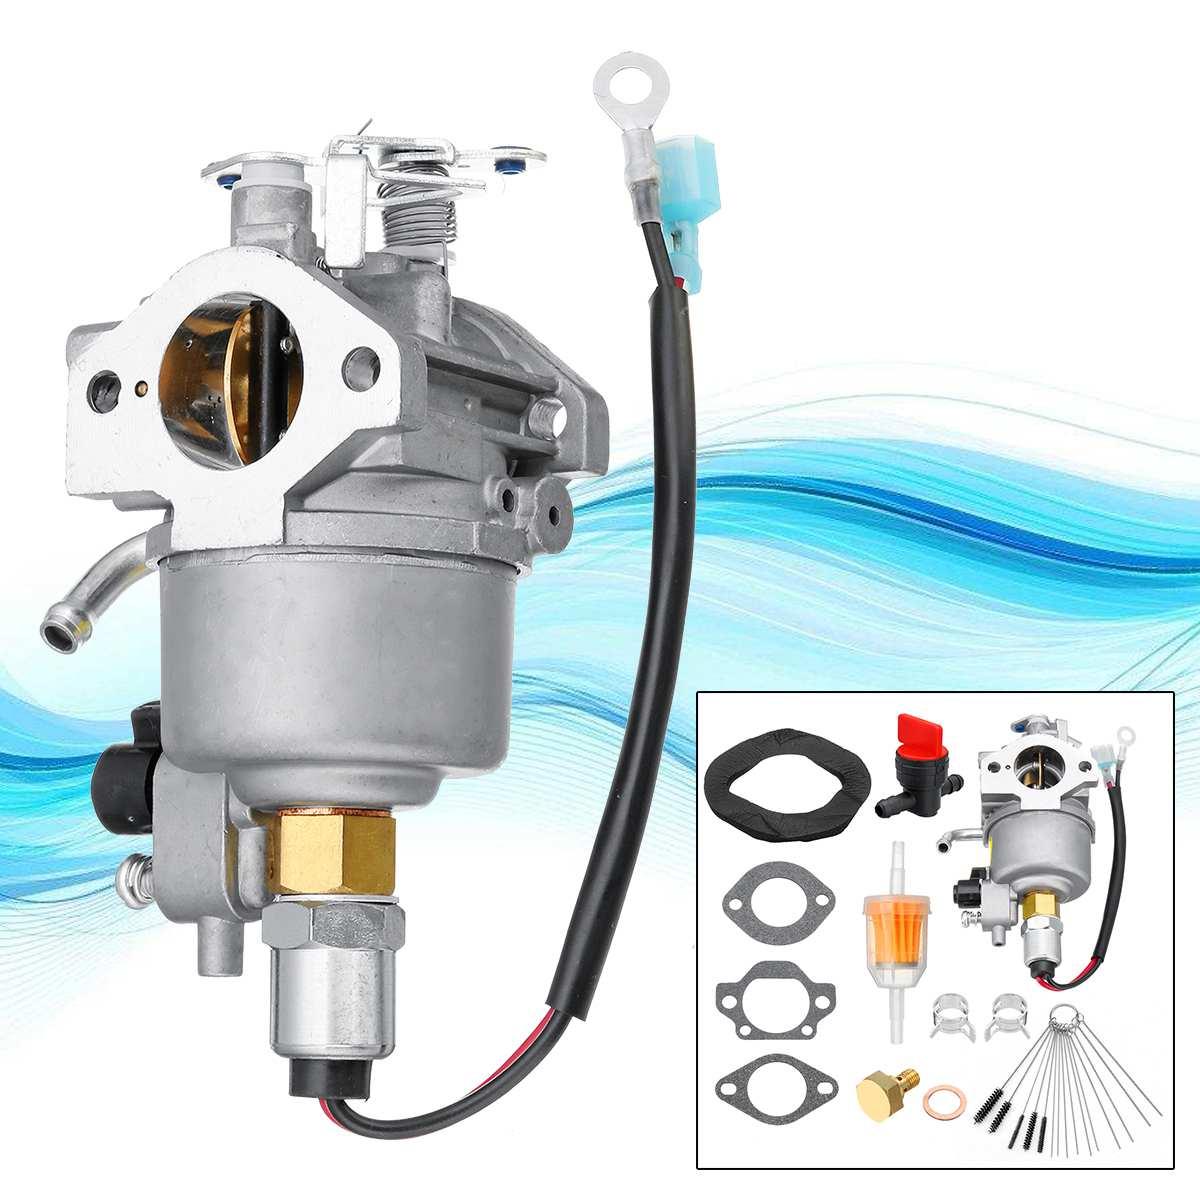 medium resolution of carburetor rebuild kit replaces onan kit a041d736 for onan engine model onan marvel schebler model 4000w 4kyfa26100 in carburetors from automobiles